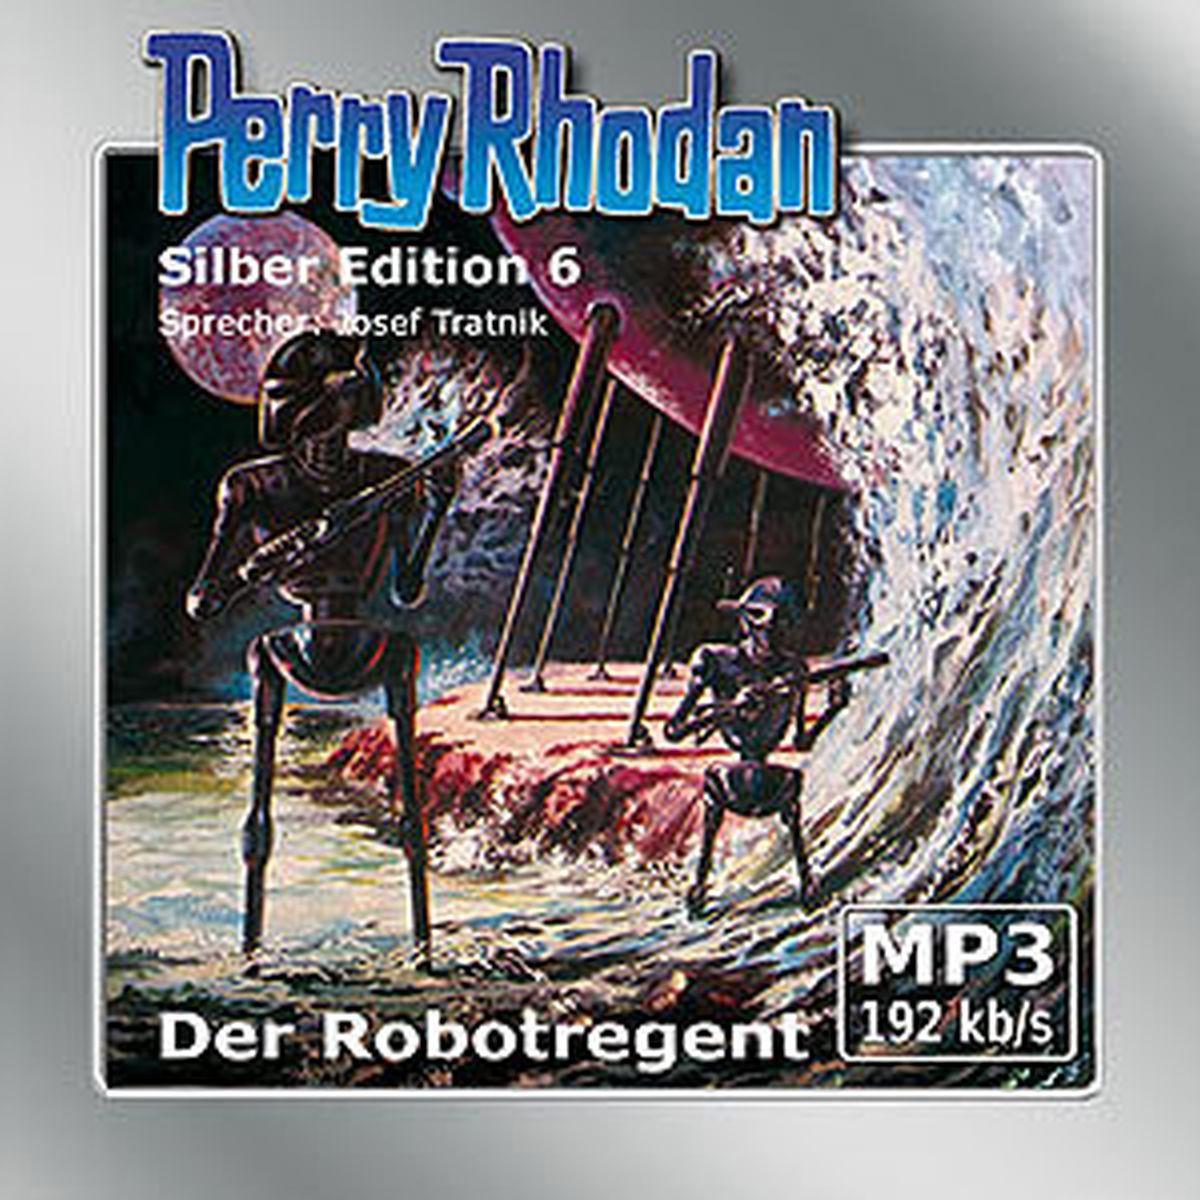 Perry Rhodan Silber Edition (mp3-CDs) 06 - Der Robotregent